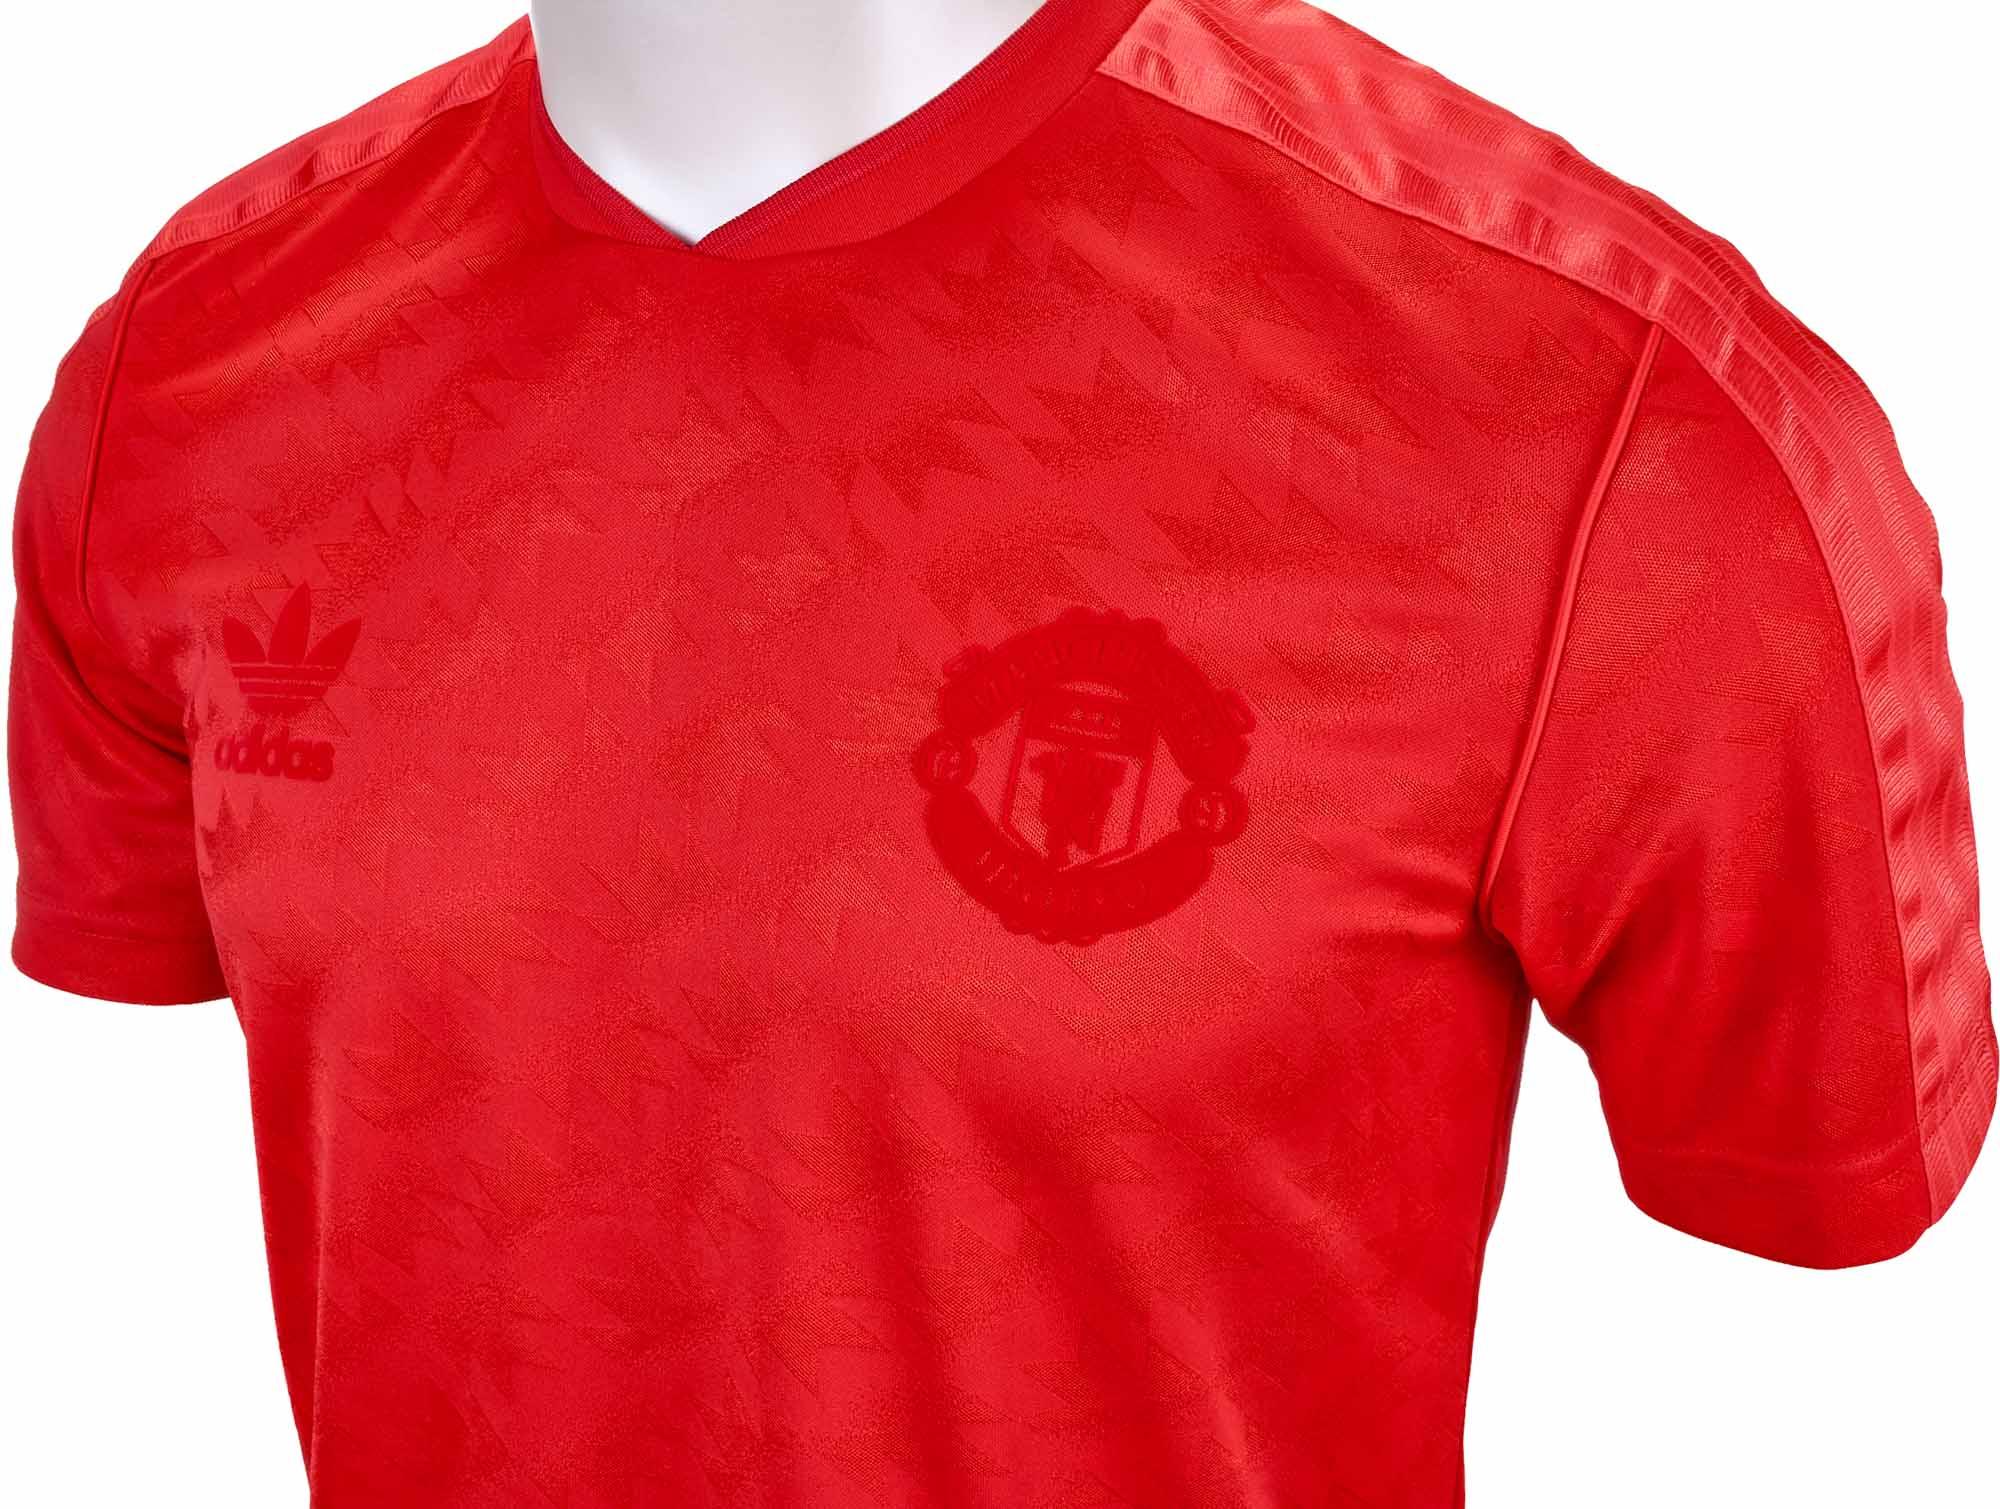 4633d70ab adidas Originals Manchester United Retro Jersey - Red